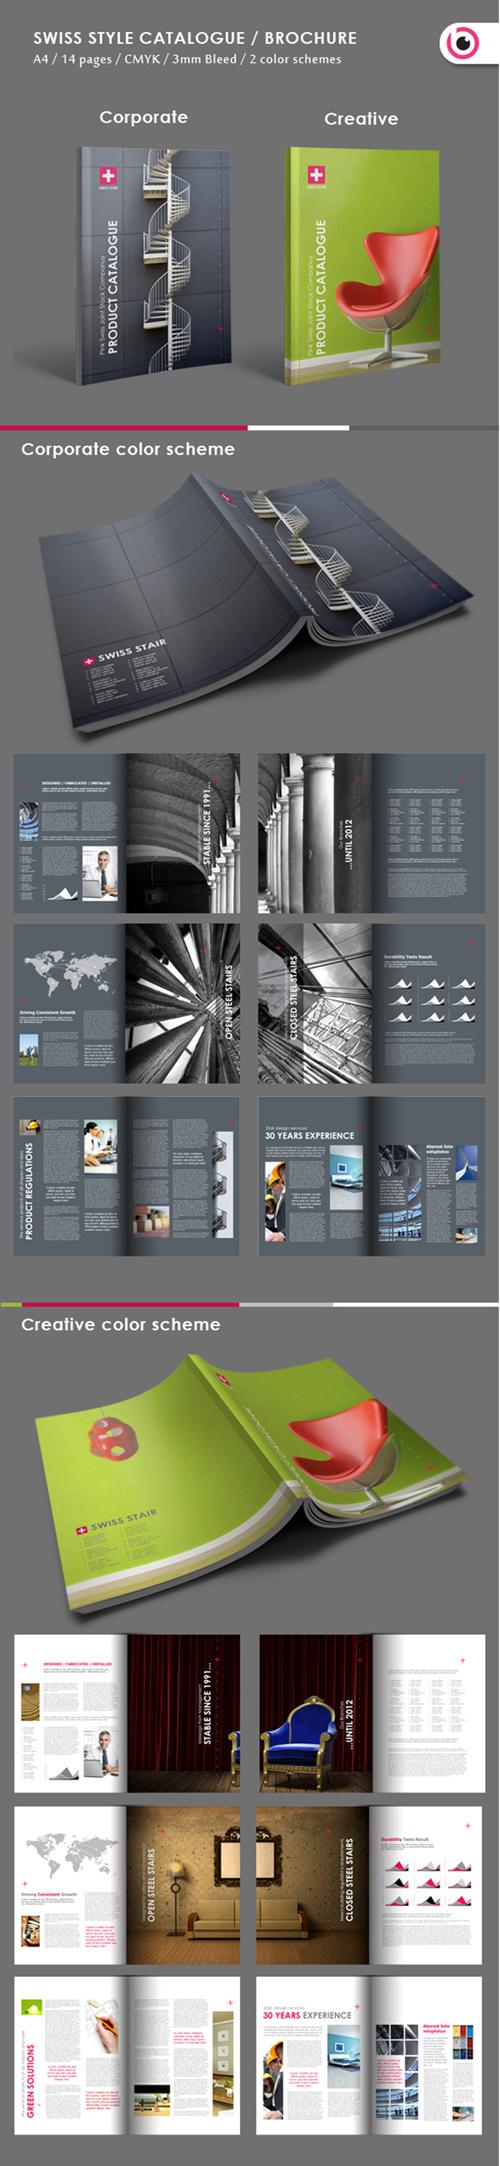 Swiss Style Brochure Template